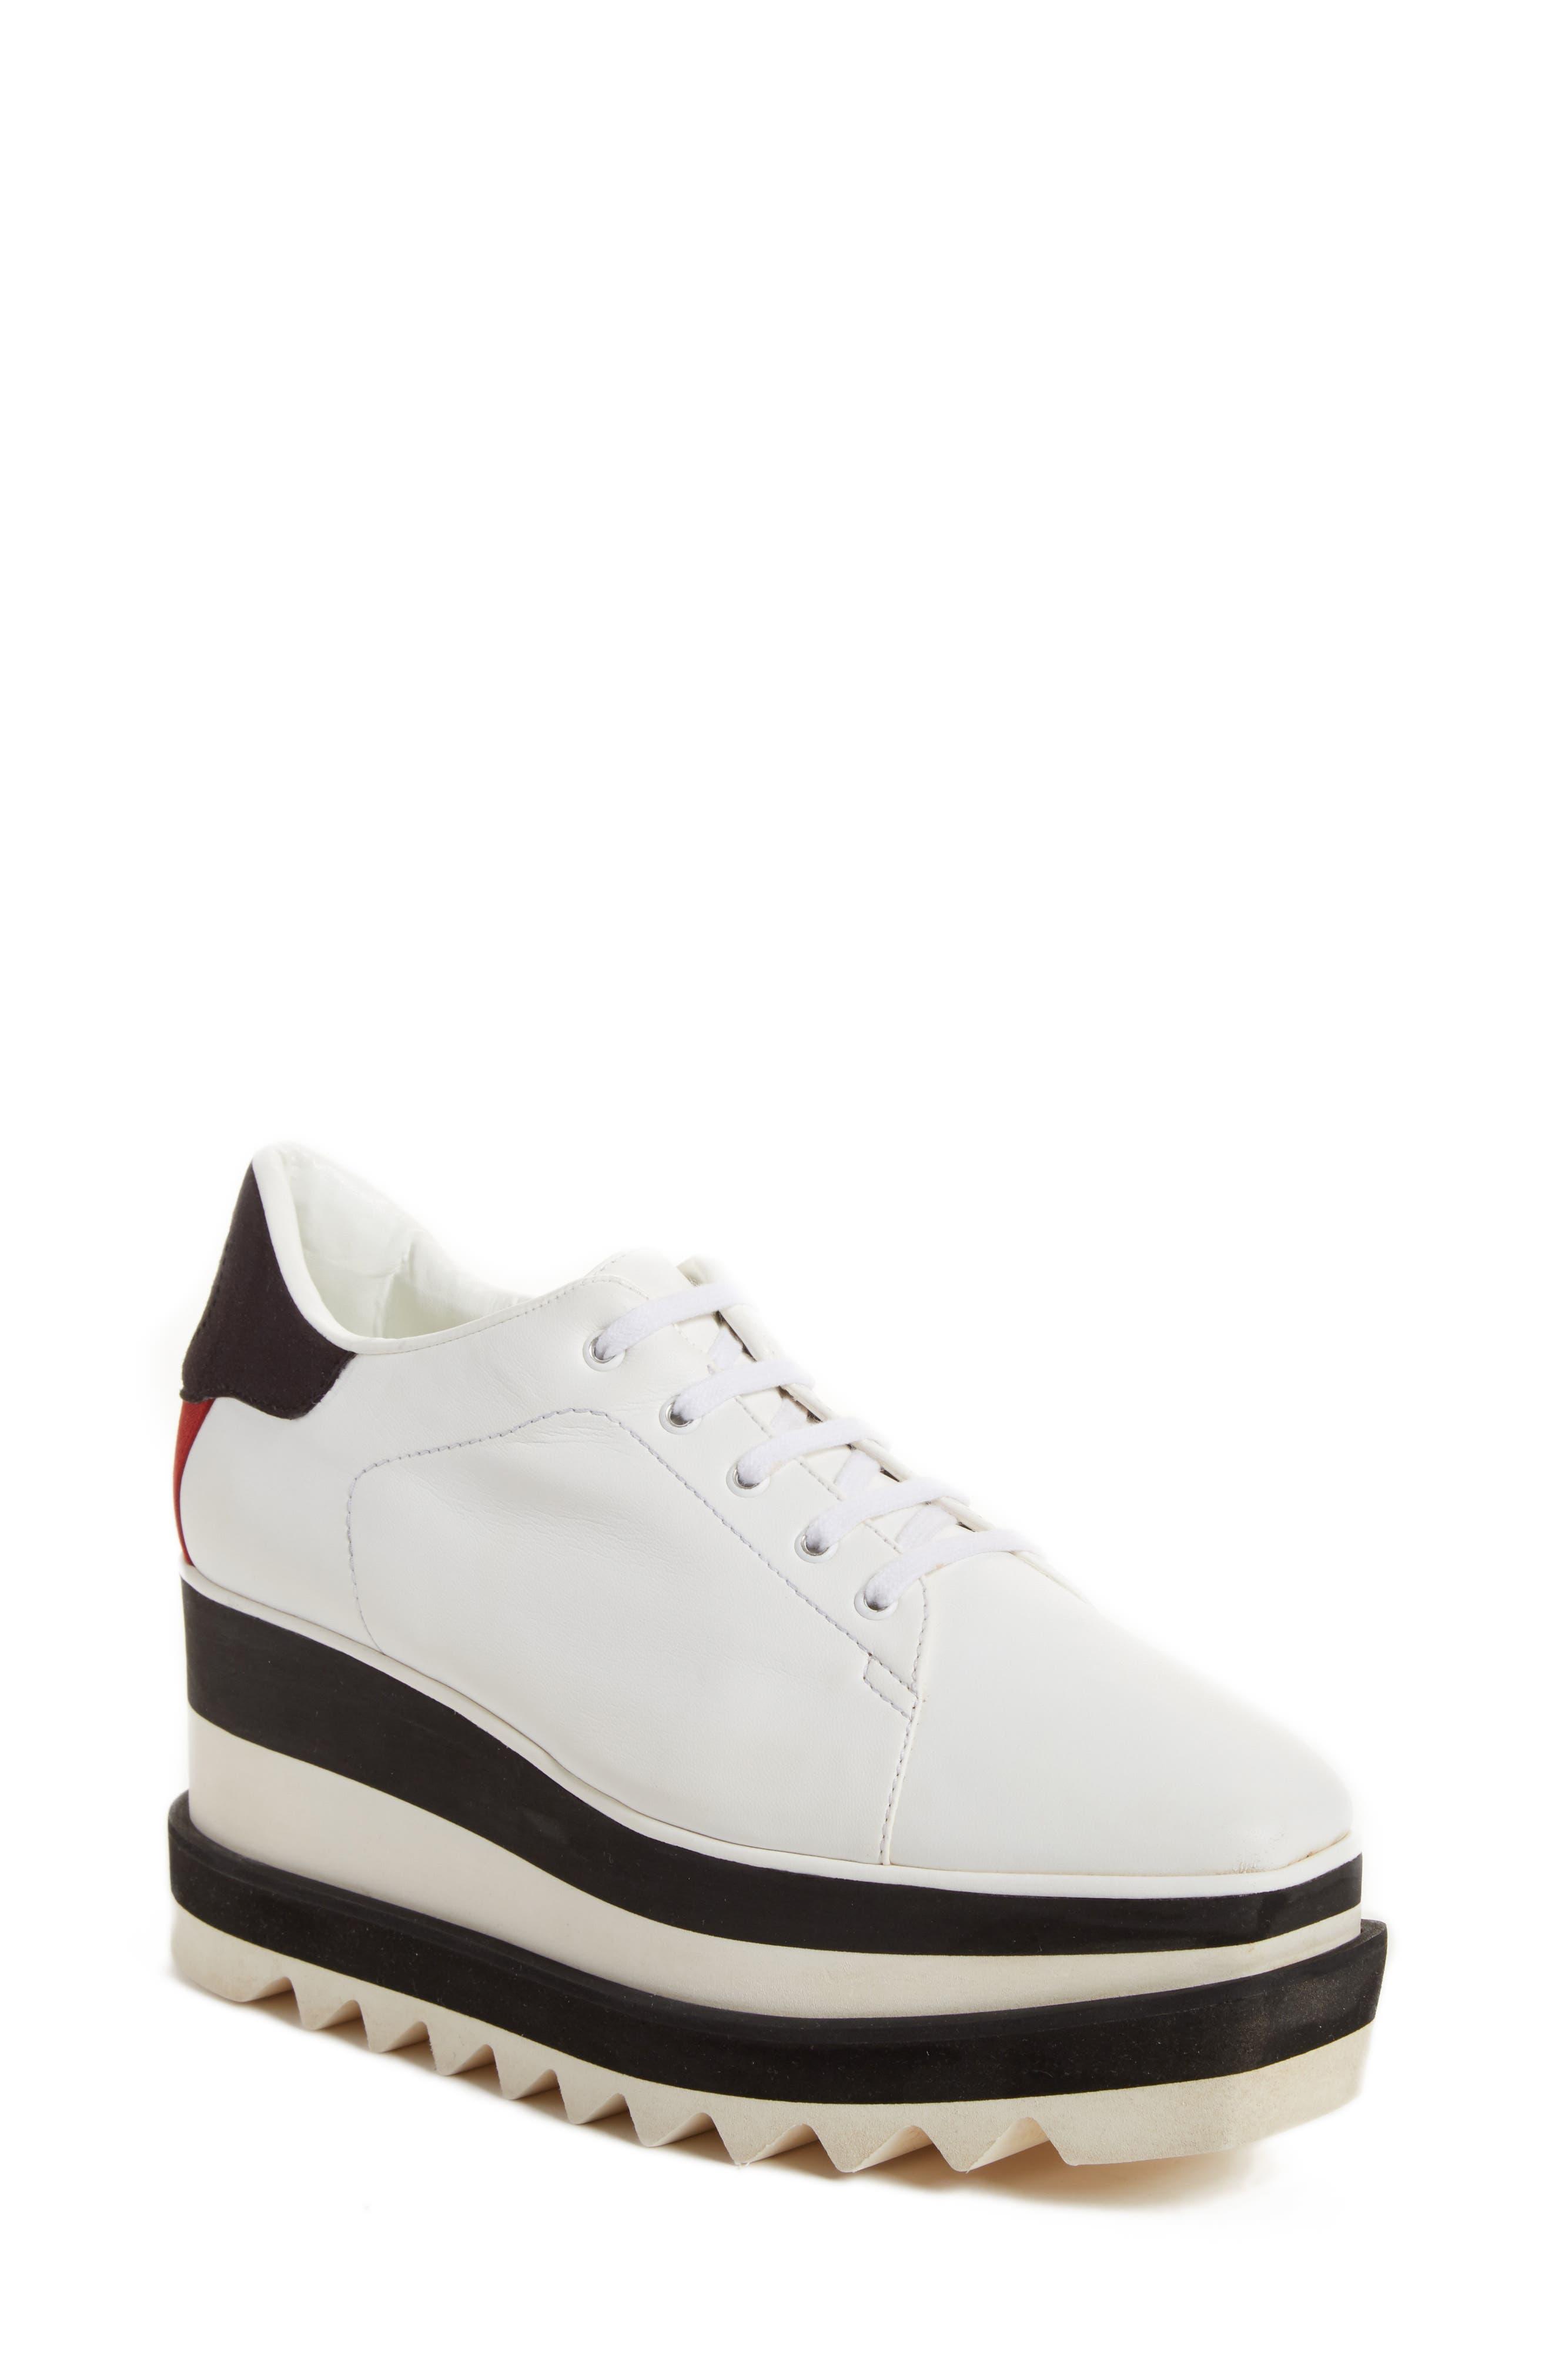 Main Image - Stella McCartney Sneak-Elyse Flatform Sneaker (Women)